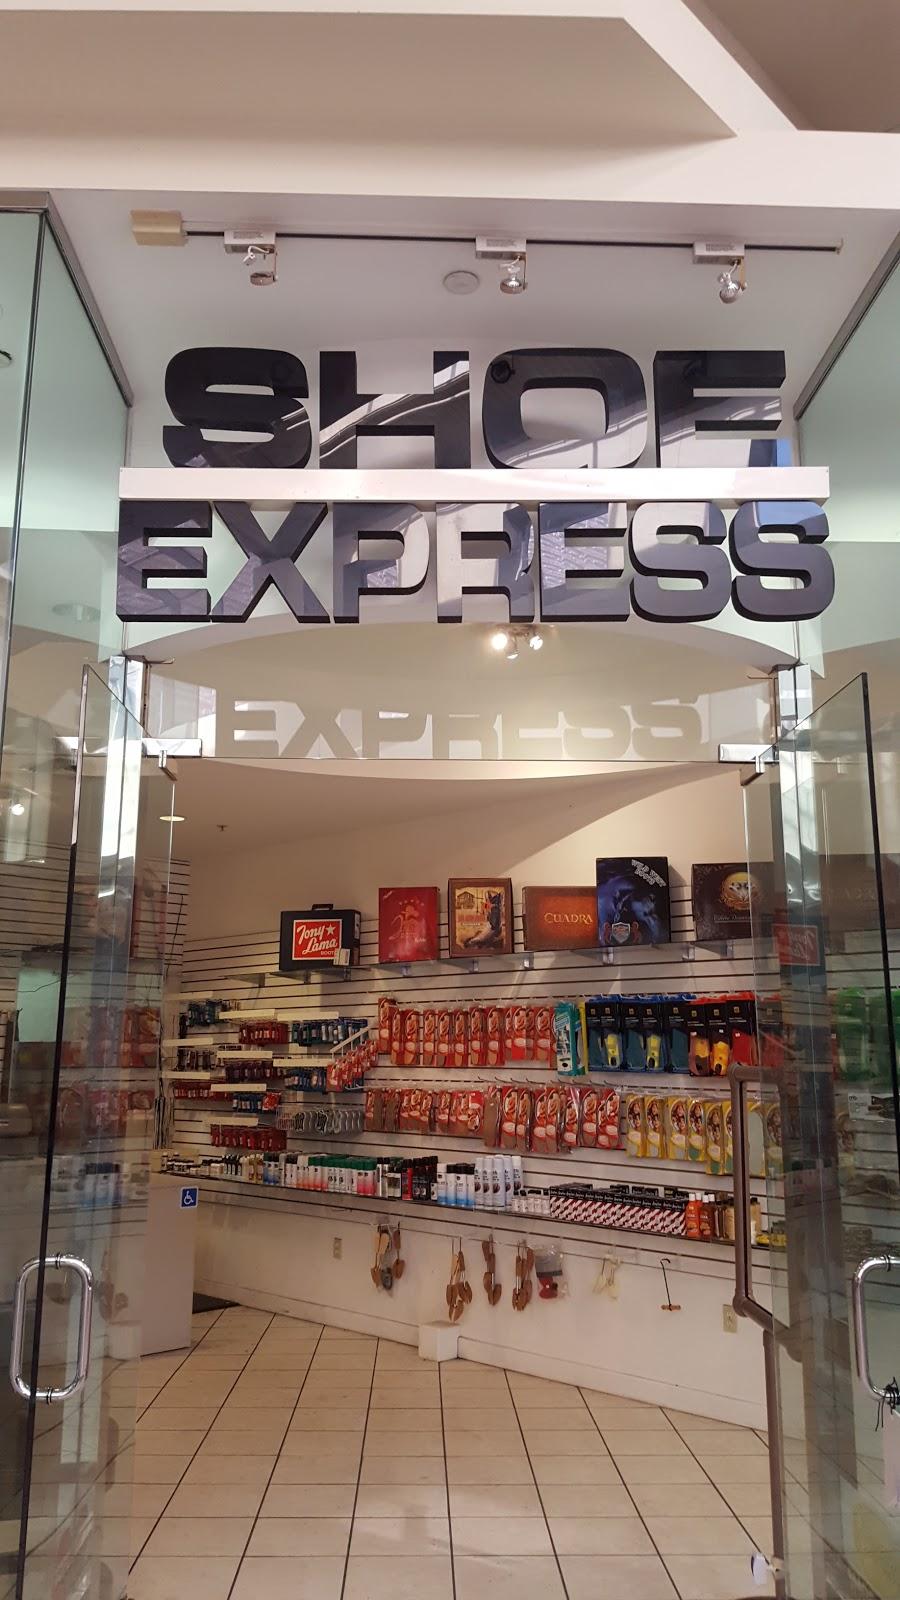 Shoe Express -   | Photo 1 of 10 | Address: 457 Stonewood St, Downey, CA 90241, USA | Phone: (562) 869-5754